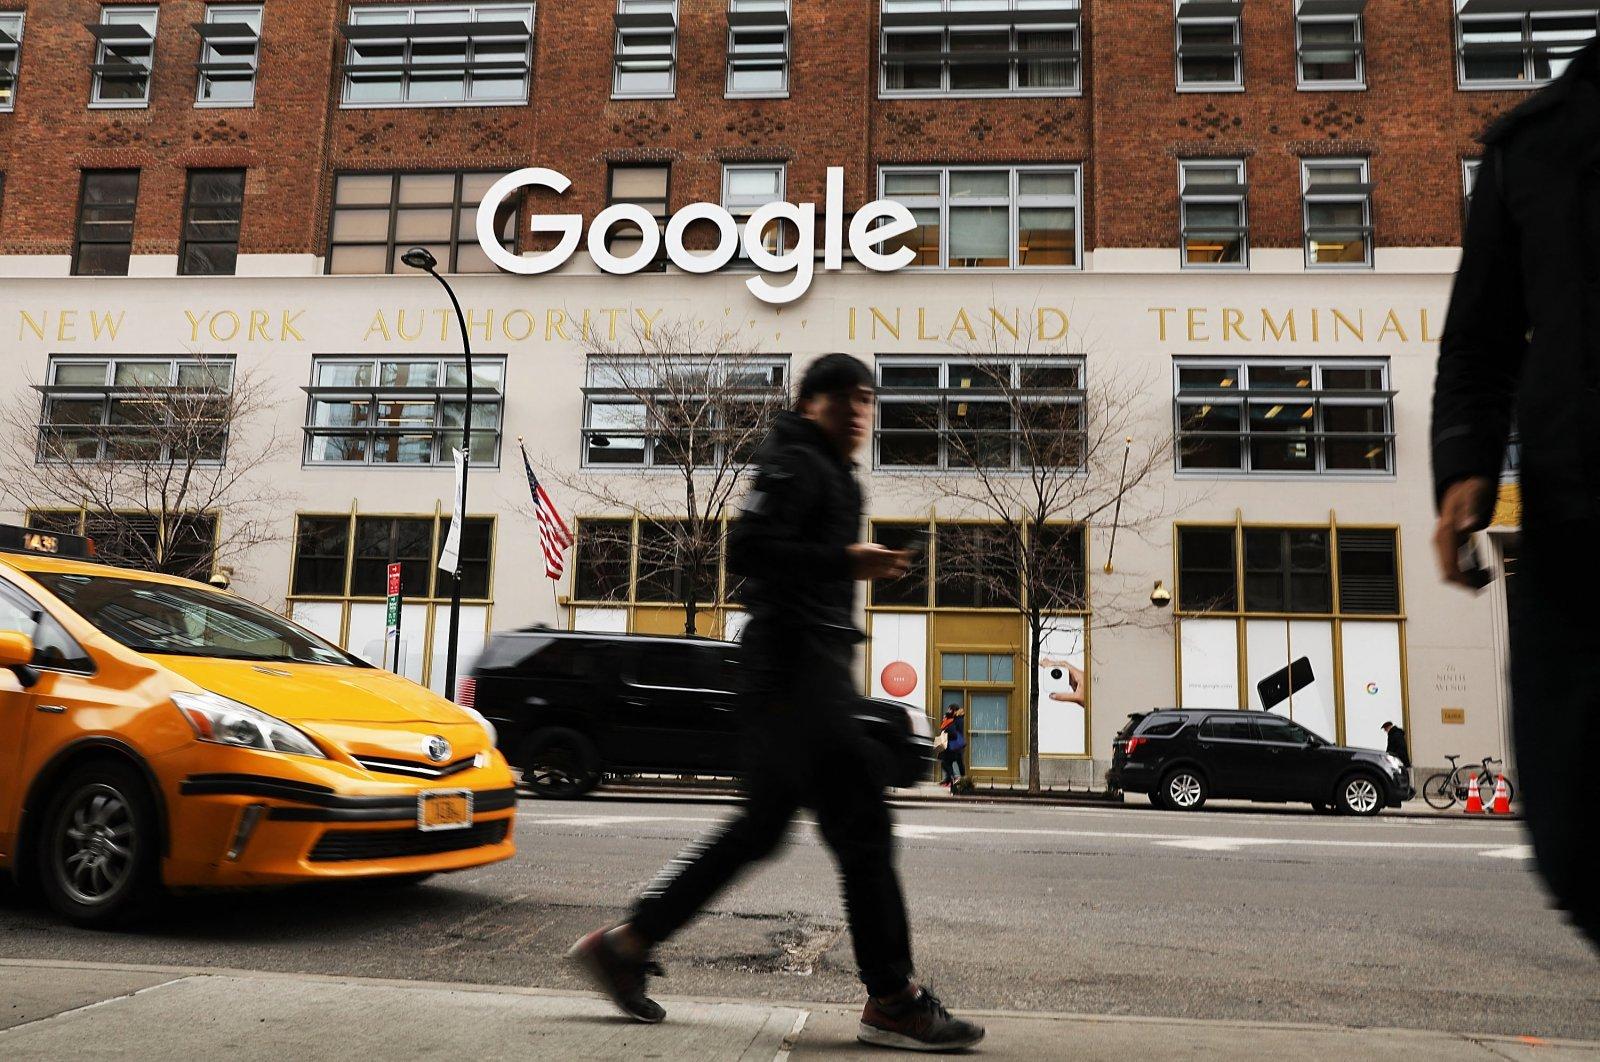 Pedestrians pass Google's New York office in lower Manhattan in New York City, U.S., March 5, 2018. (AFP Photo)